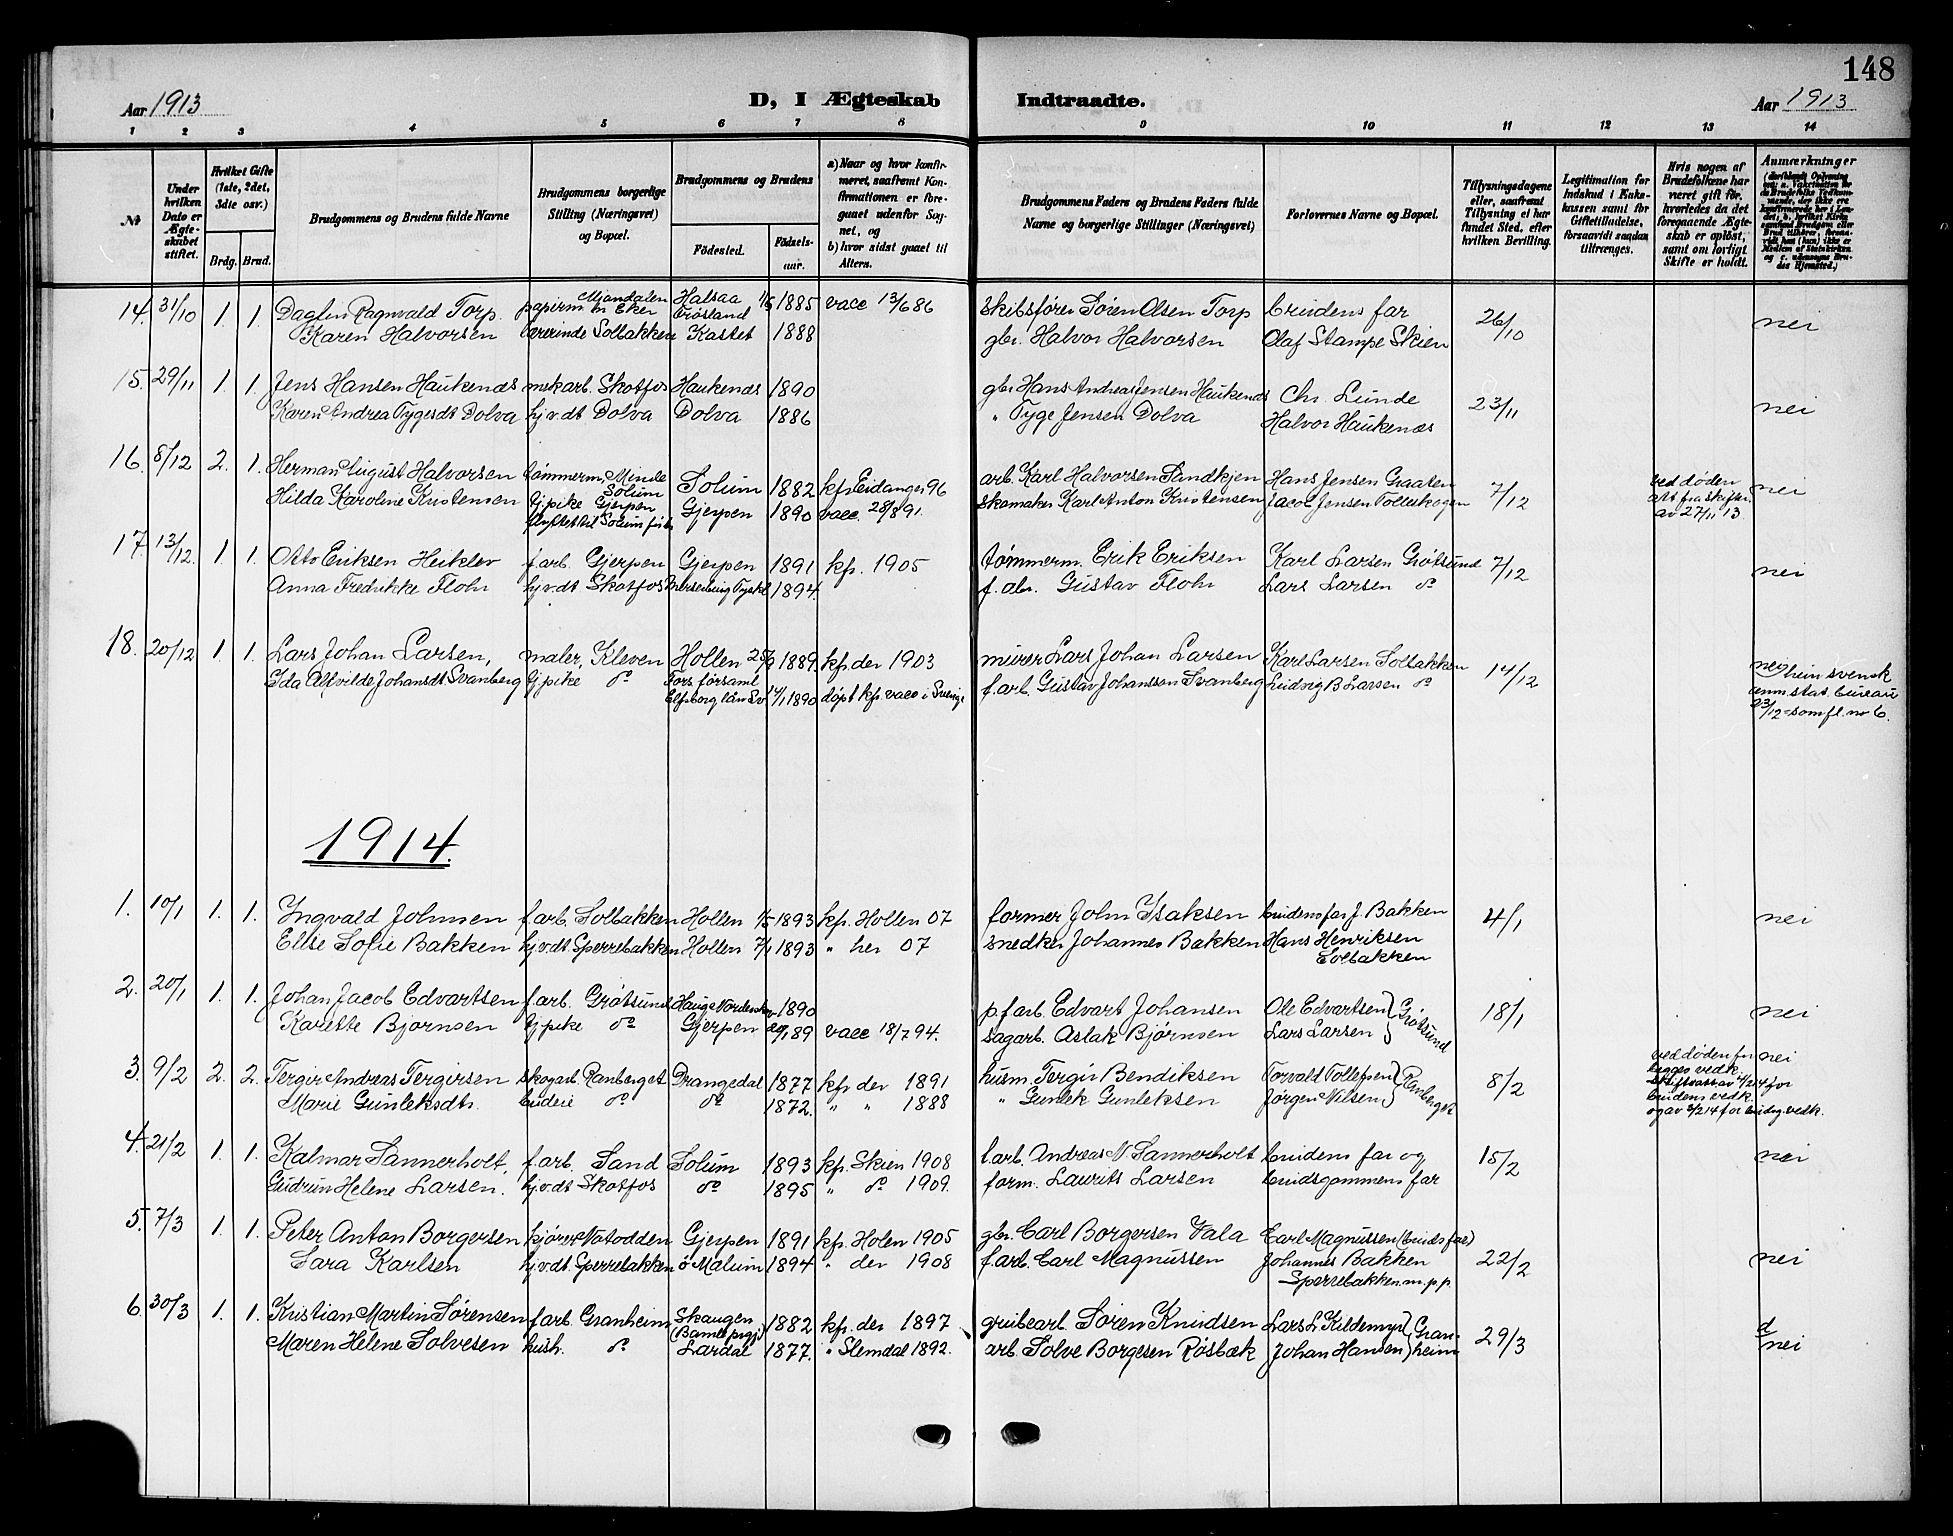 SAKO, Solum kirkebøker, G/Gb/L0005: Klokkerbok nr. II 5, 1905-1914, s. 148